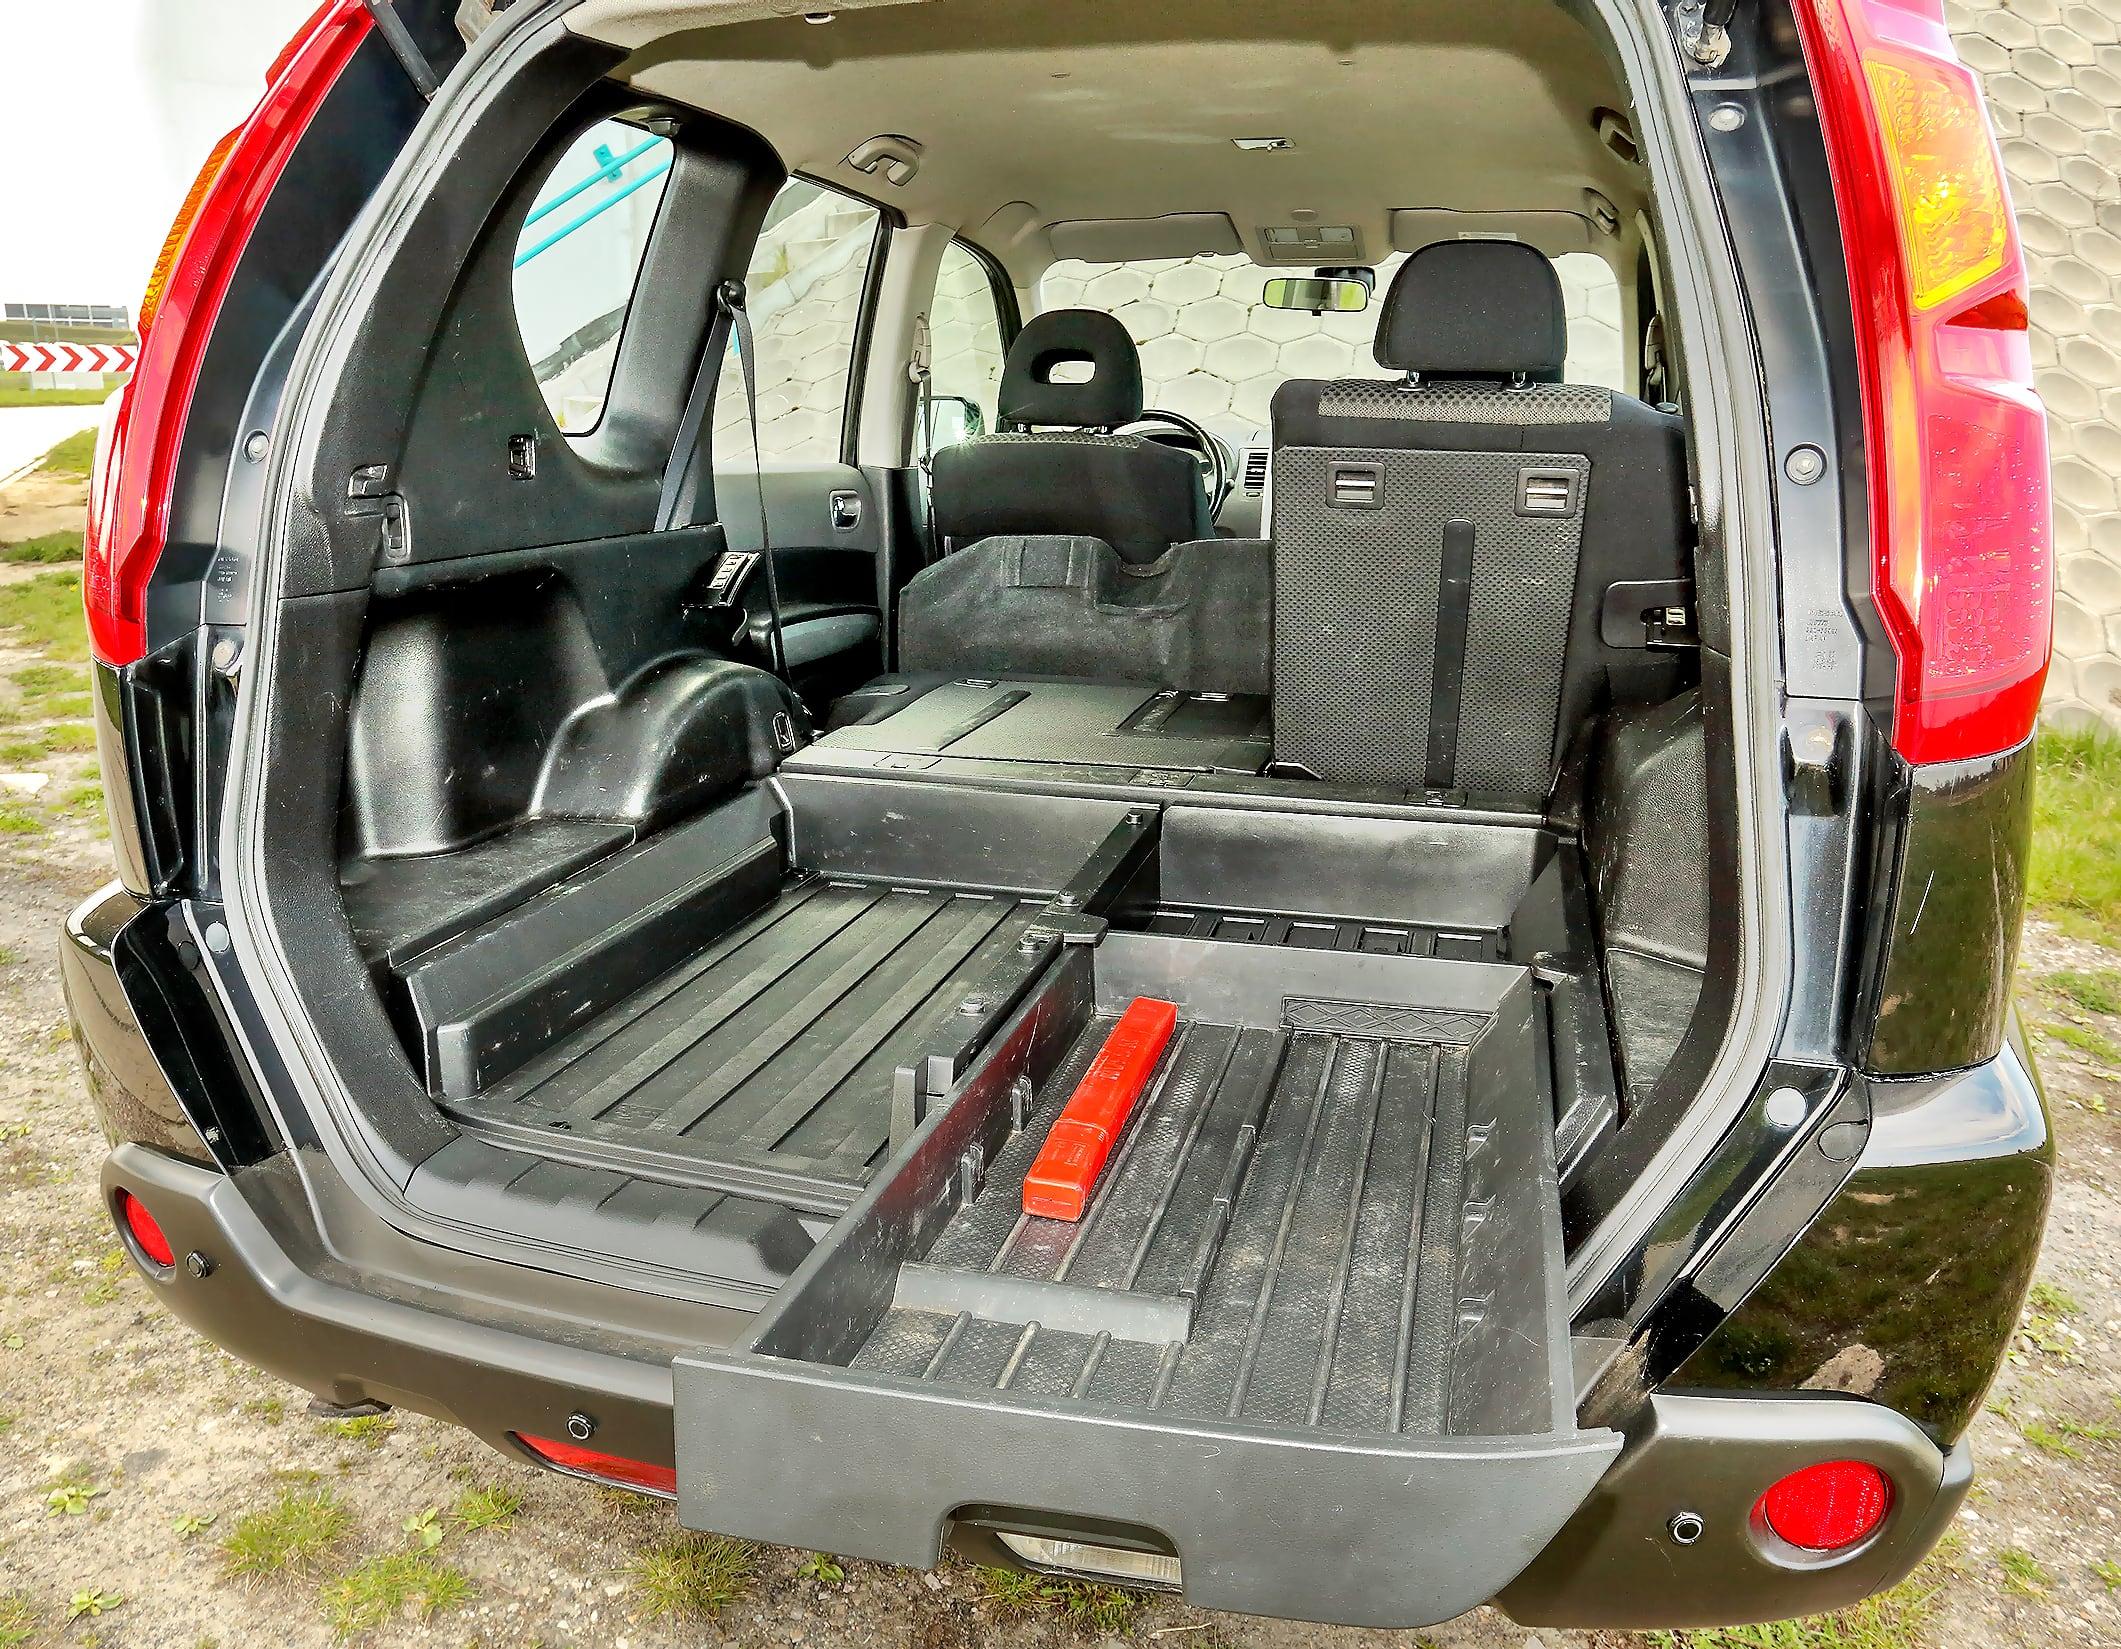 Nissan-X-Trail-2.0-dCi_10